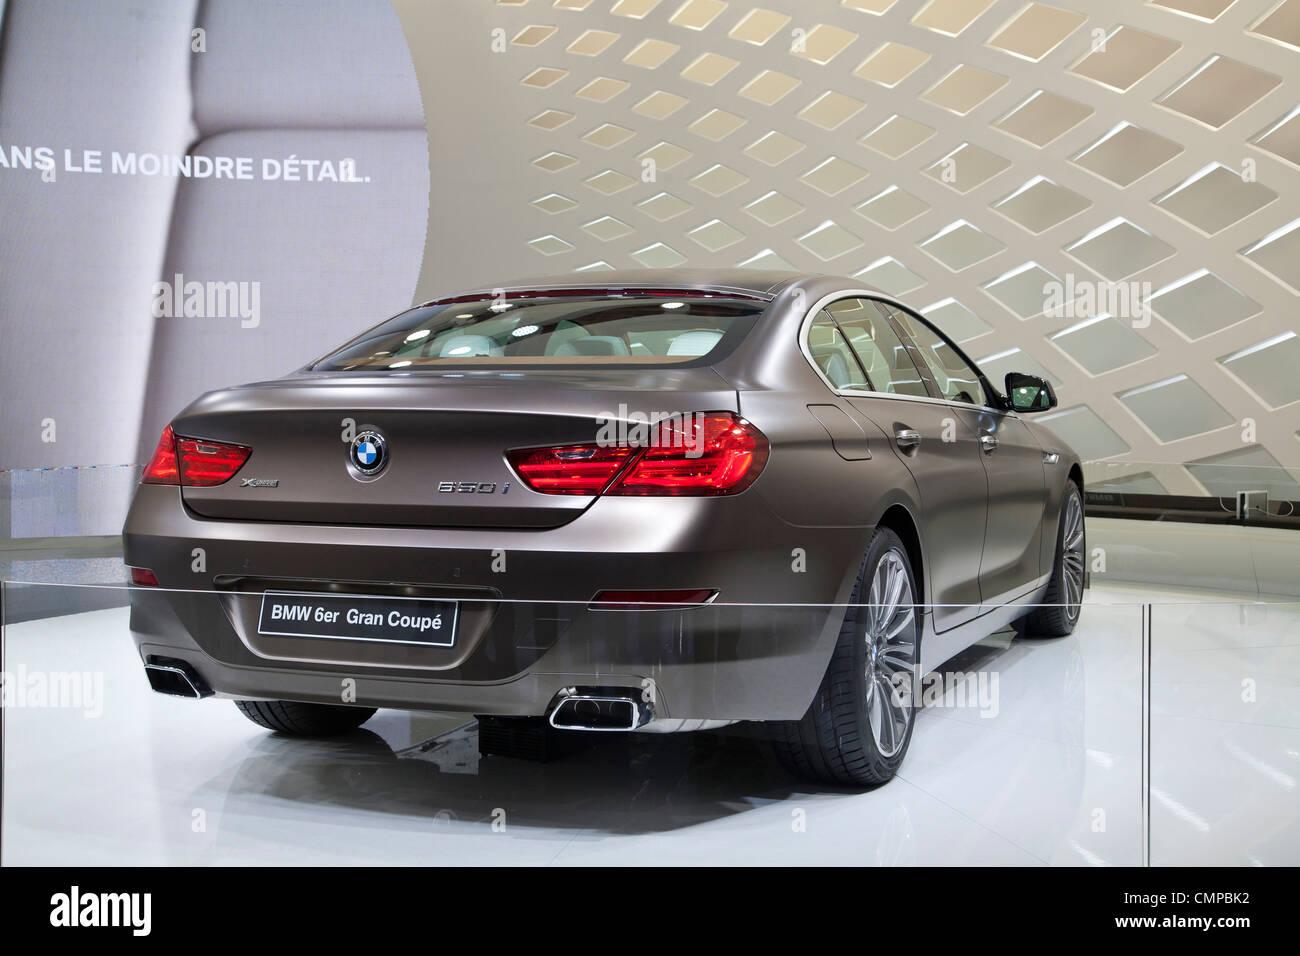 BMW 6er Gran Coupe at the Geneva Motor Show 2012 - Stock Image